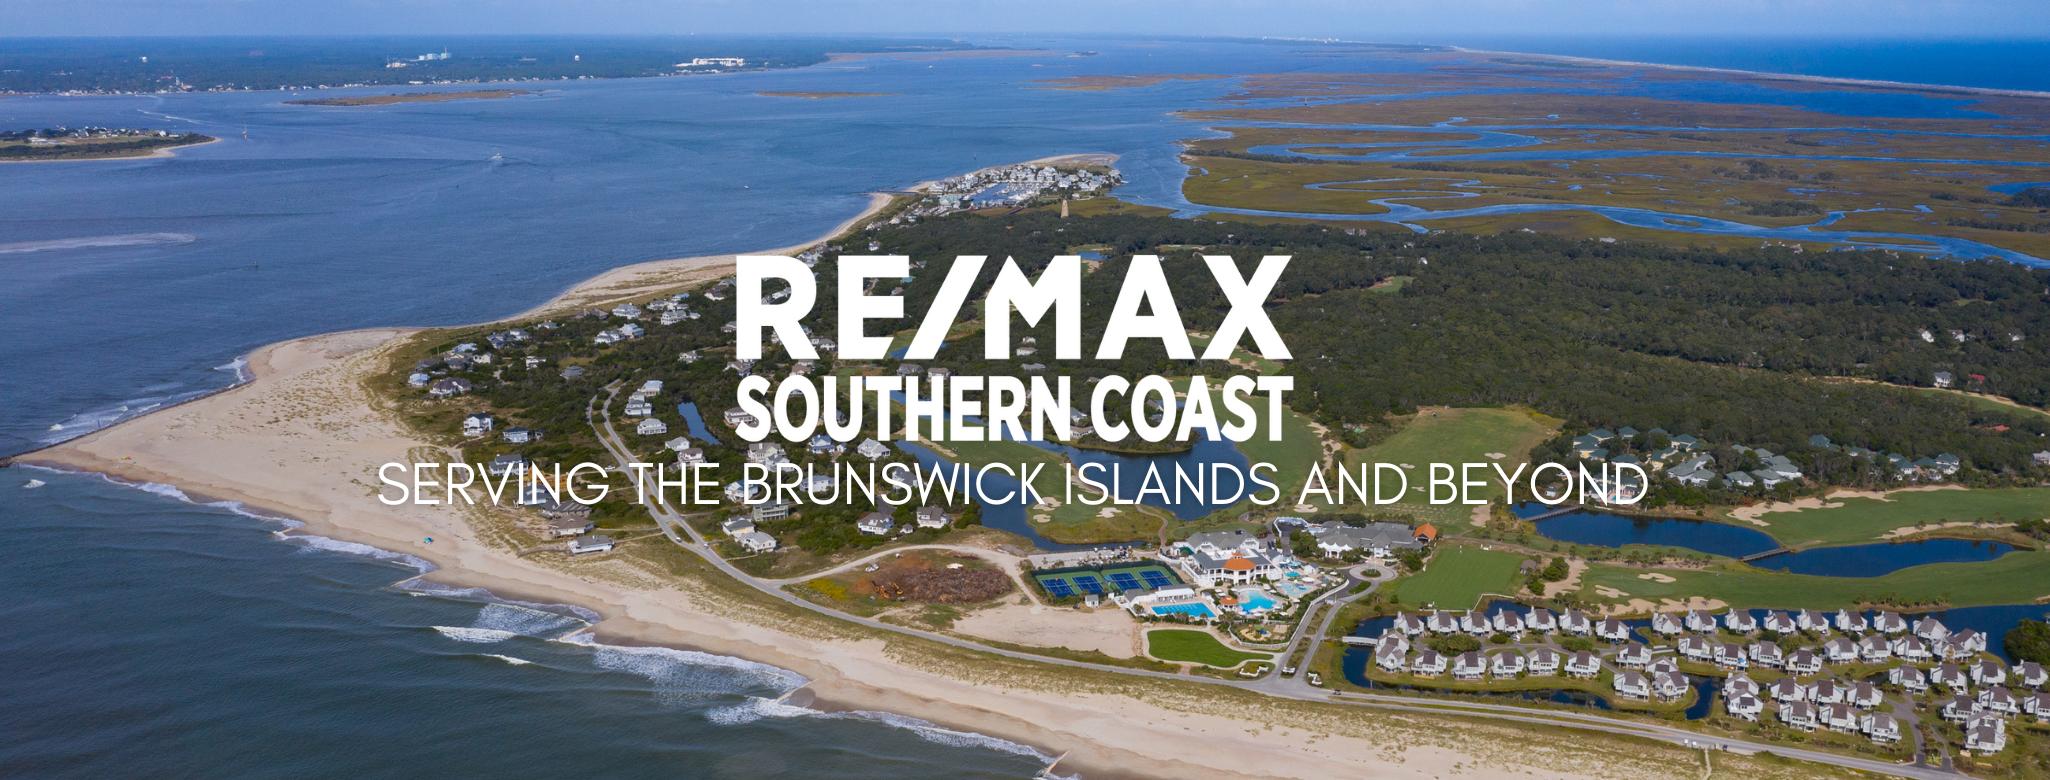 RE/MAX Southern Coast